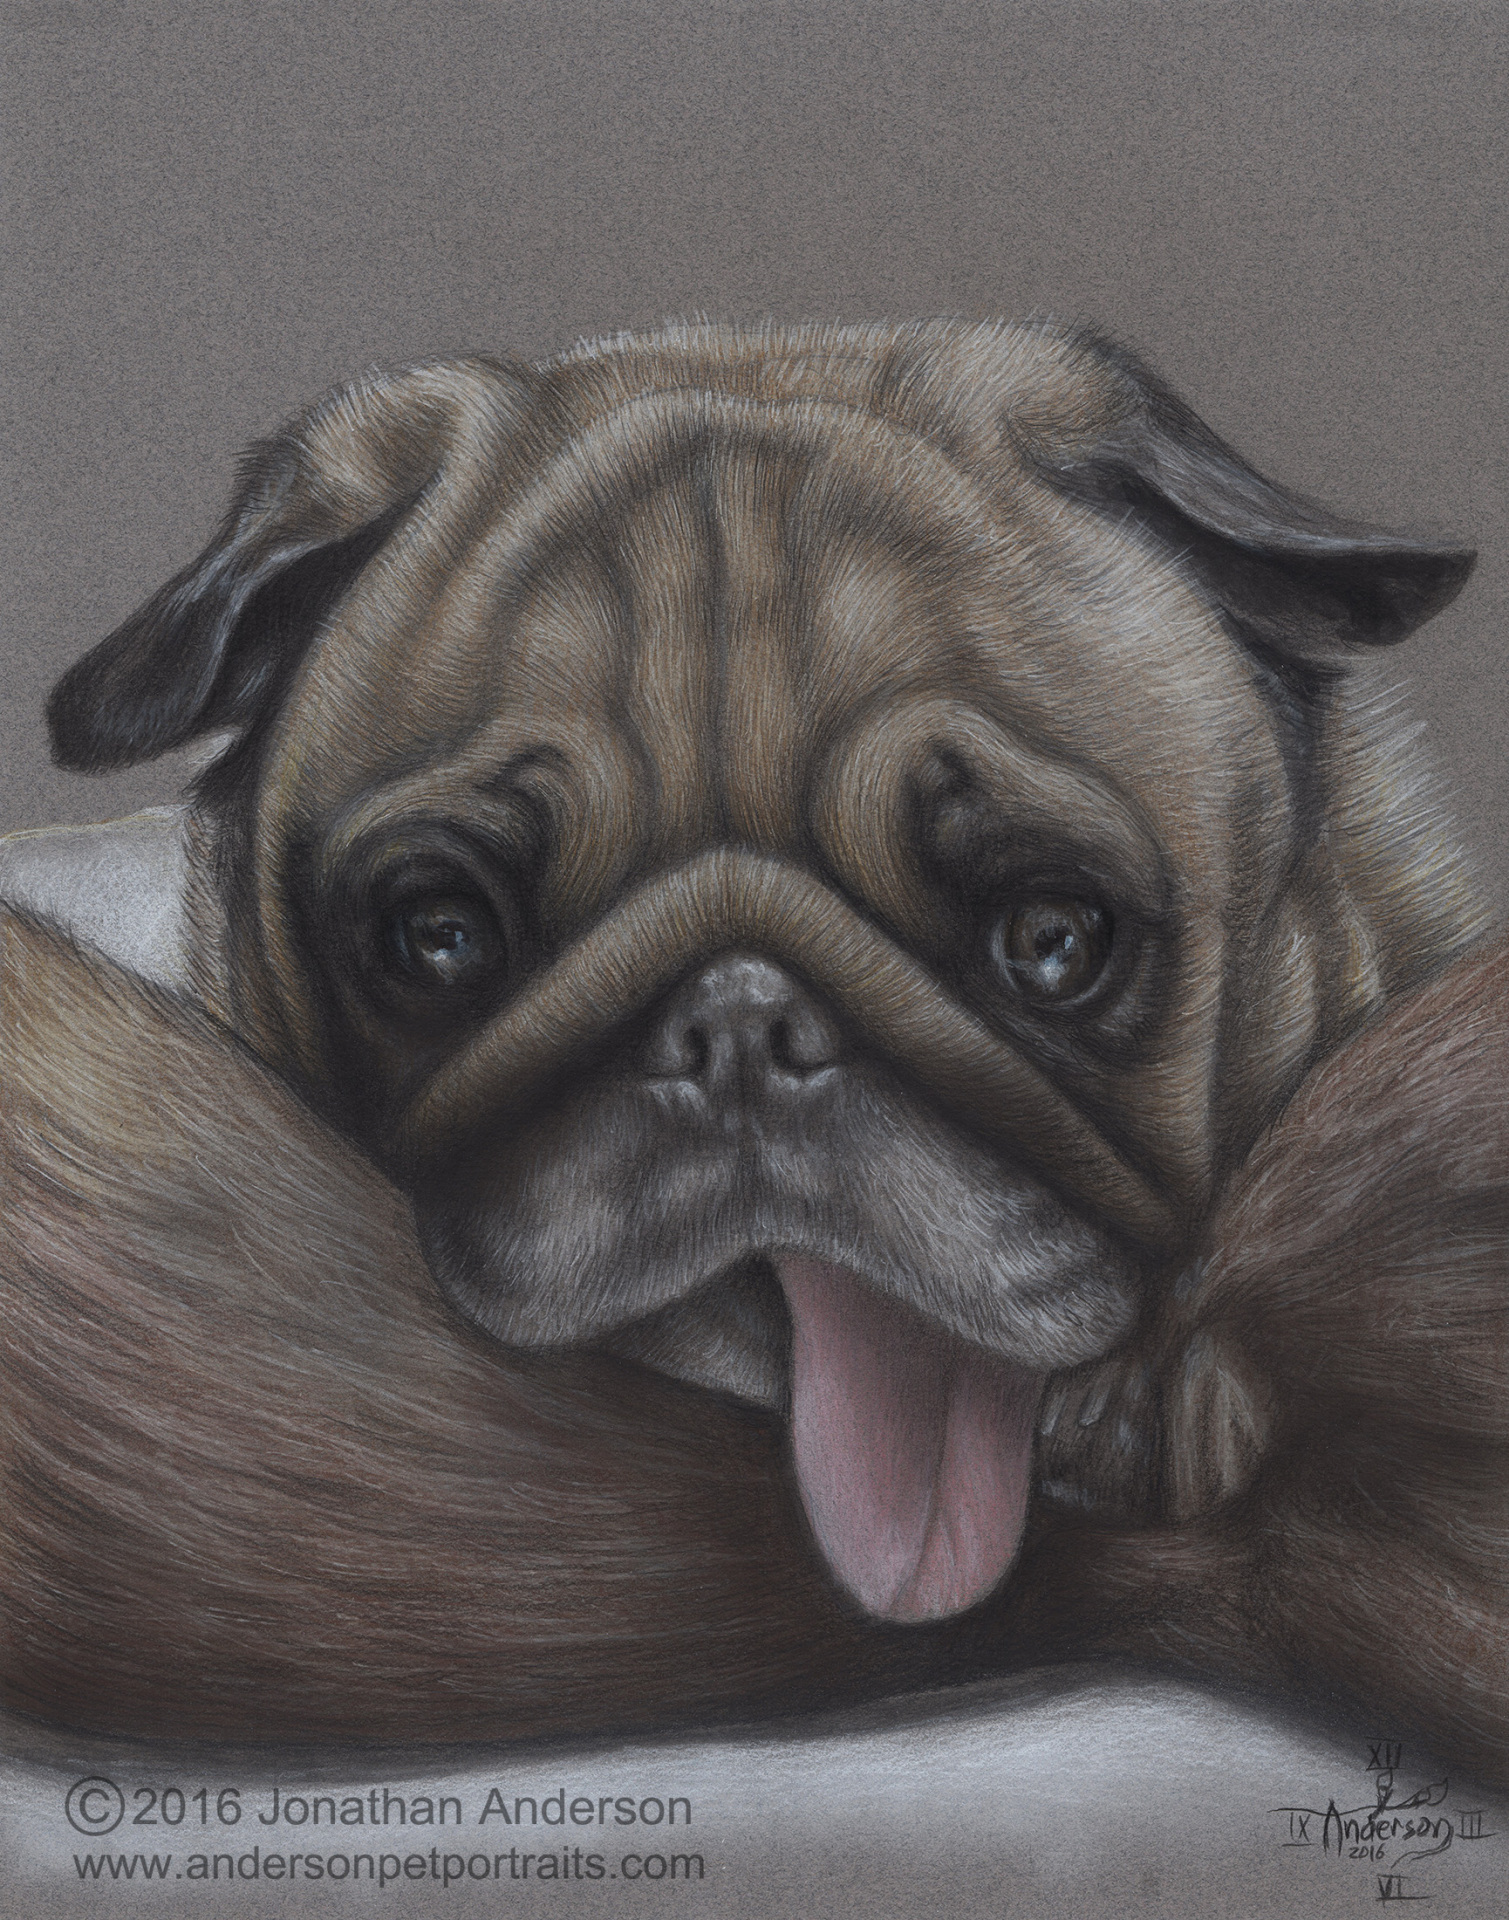 Pug close up